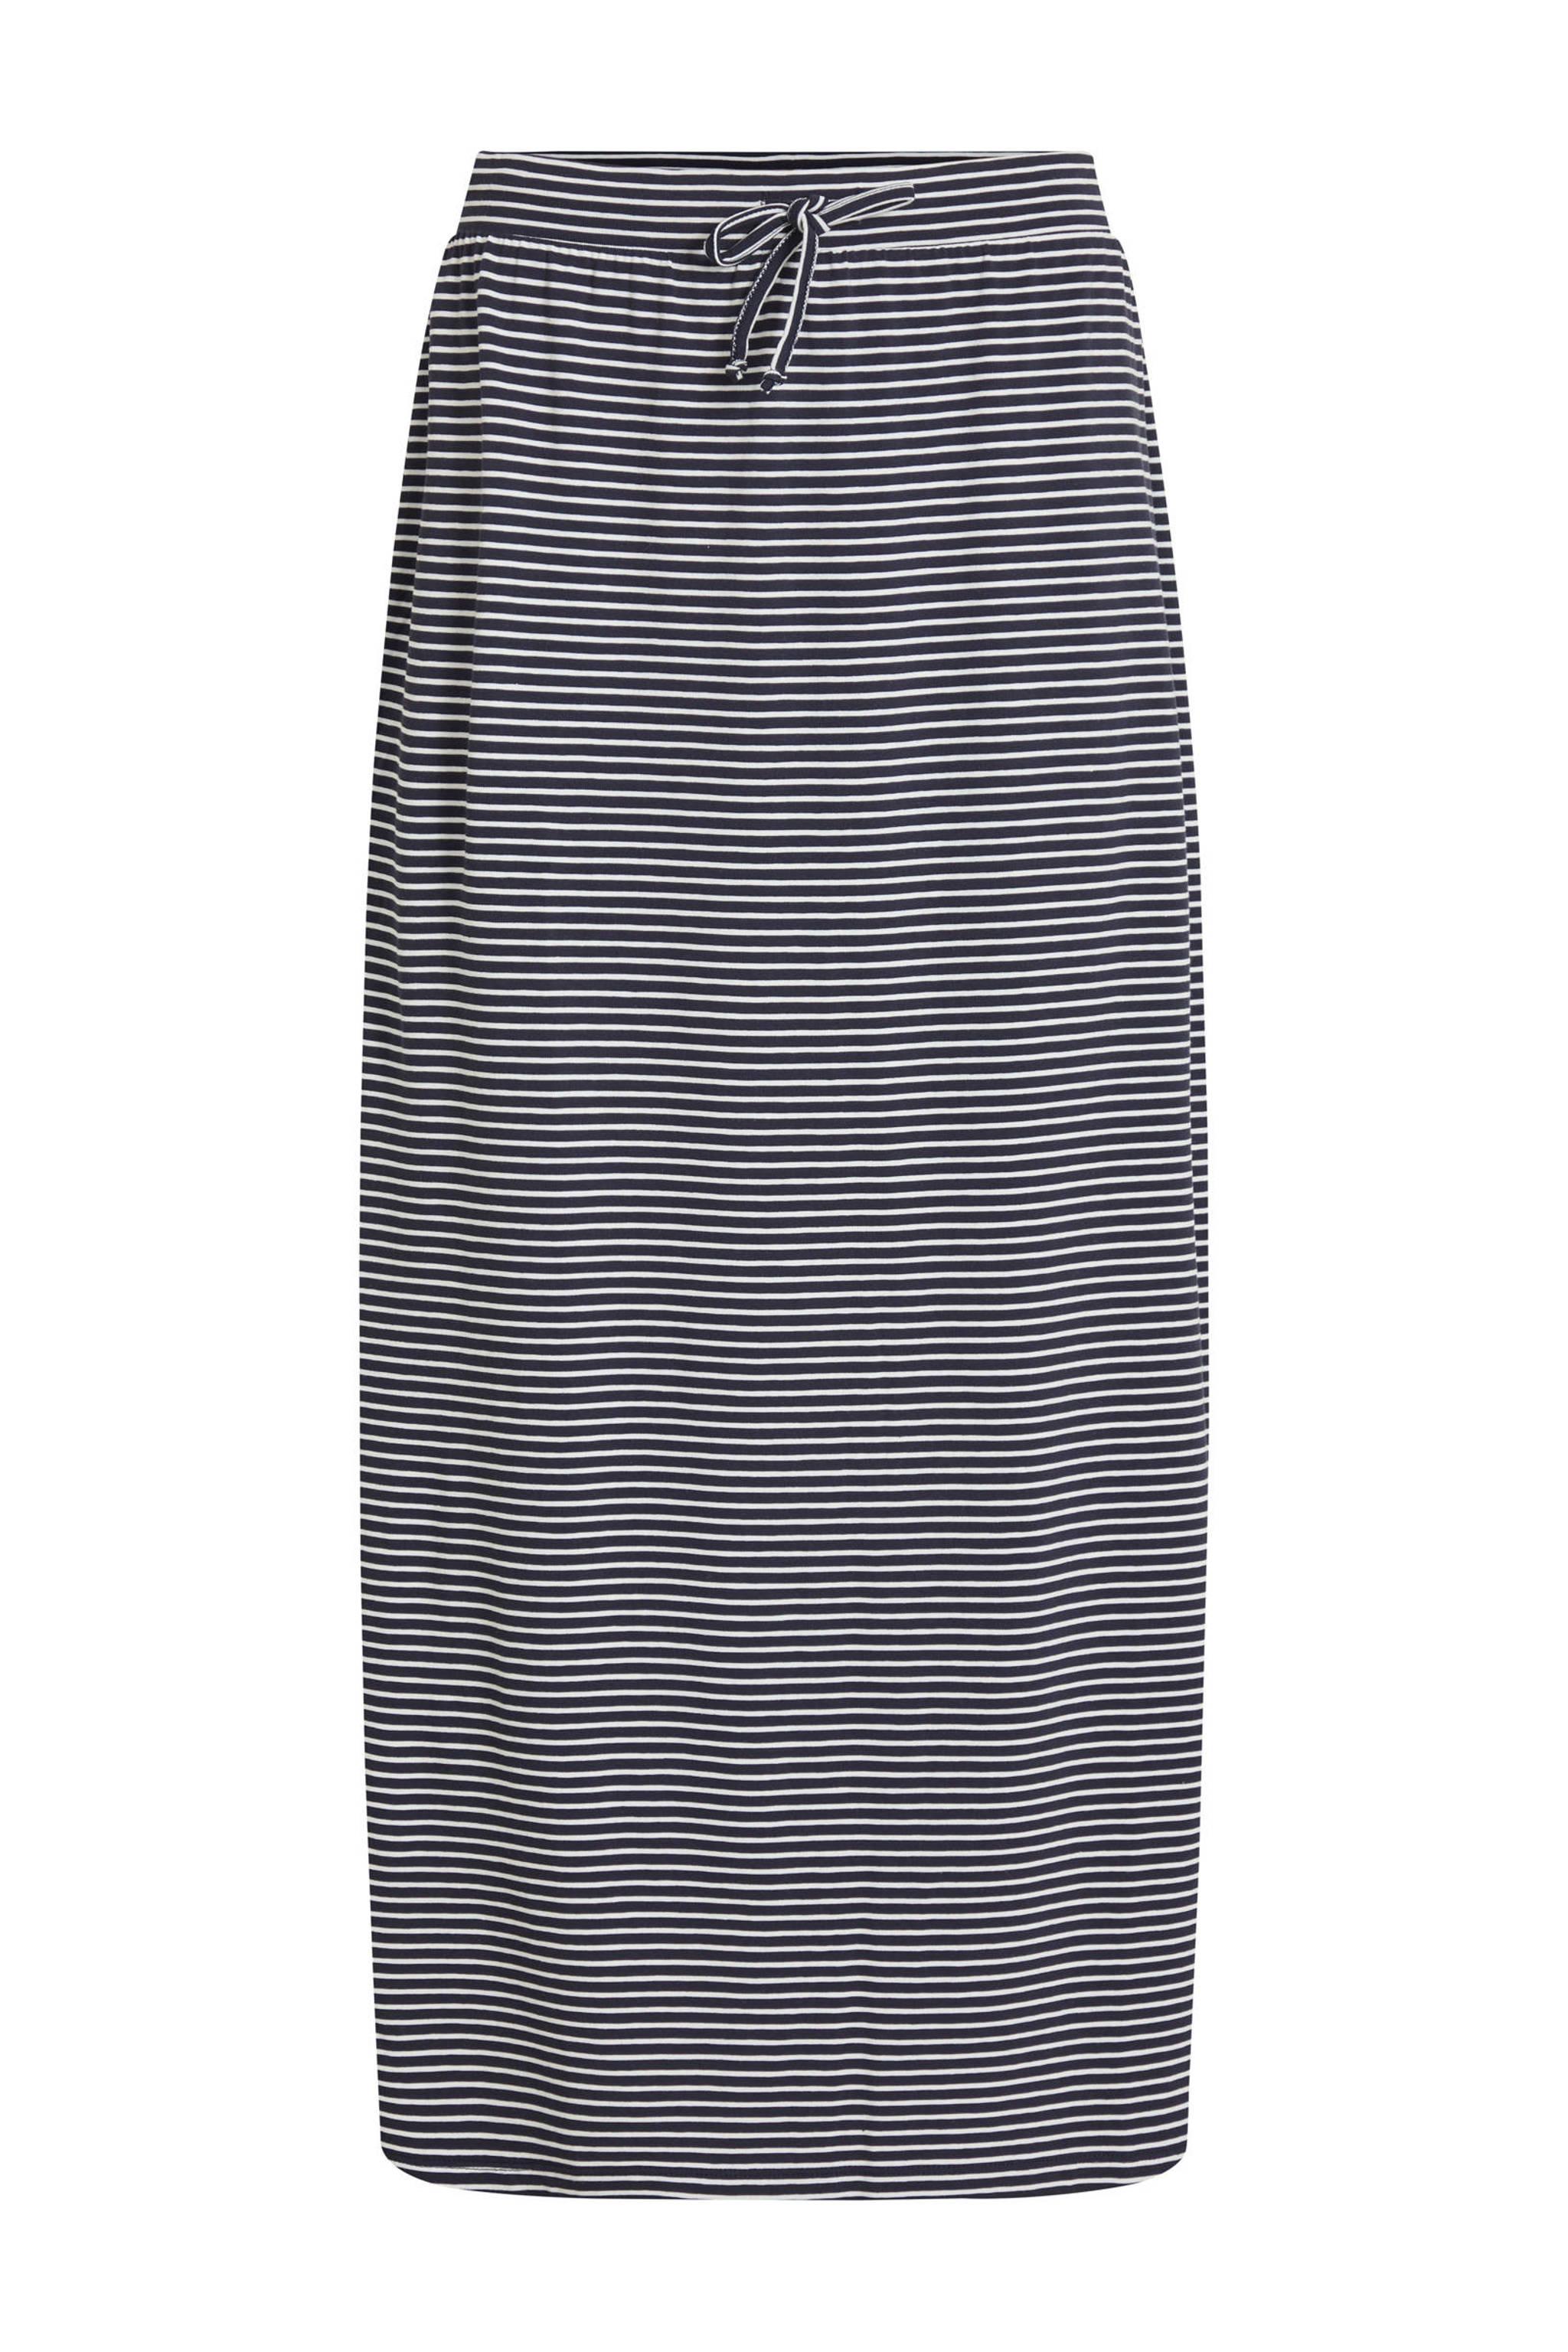 Verbazingwekkend OBJECT gestreepte rok blauw/wit | wehkamp EG-74